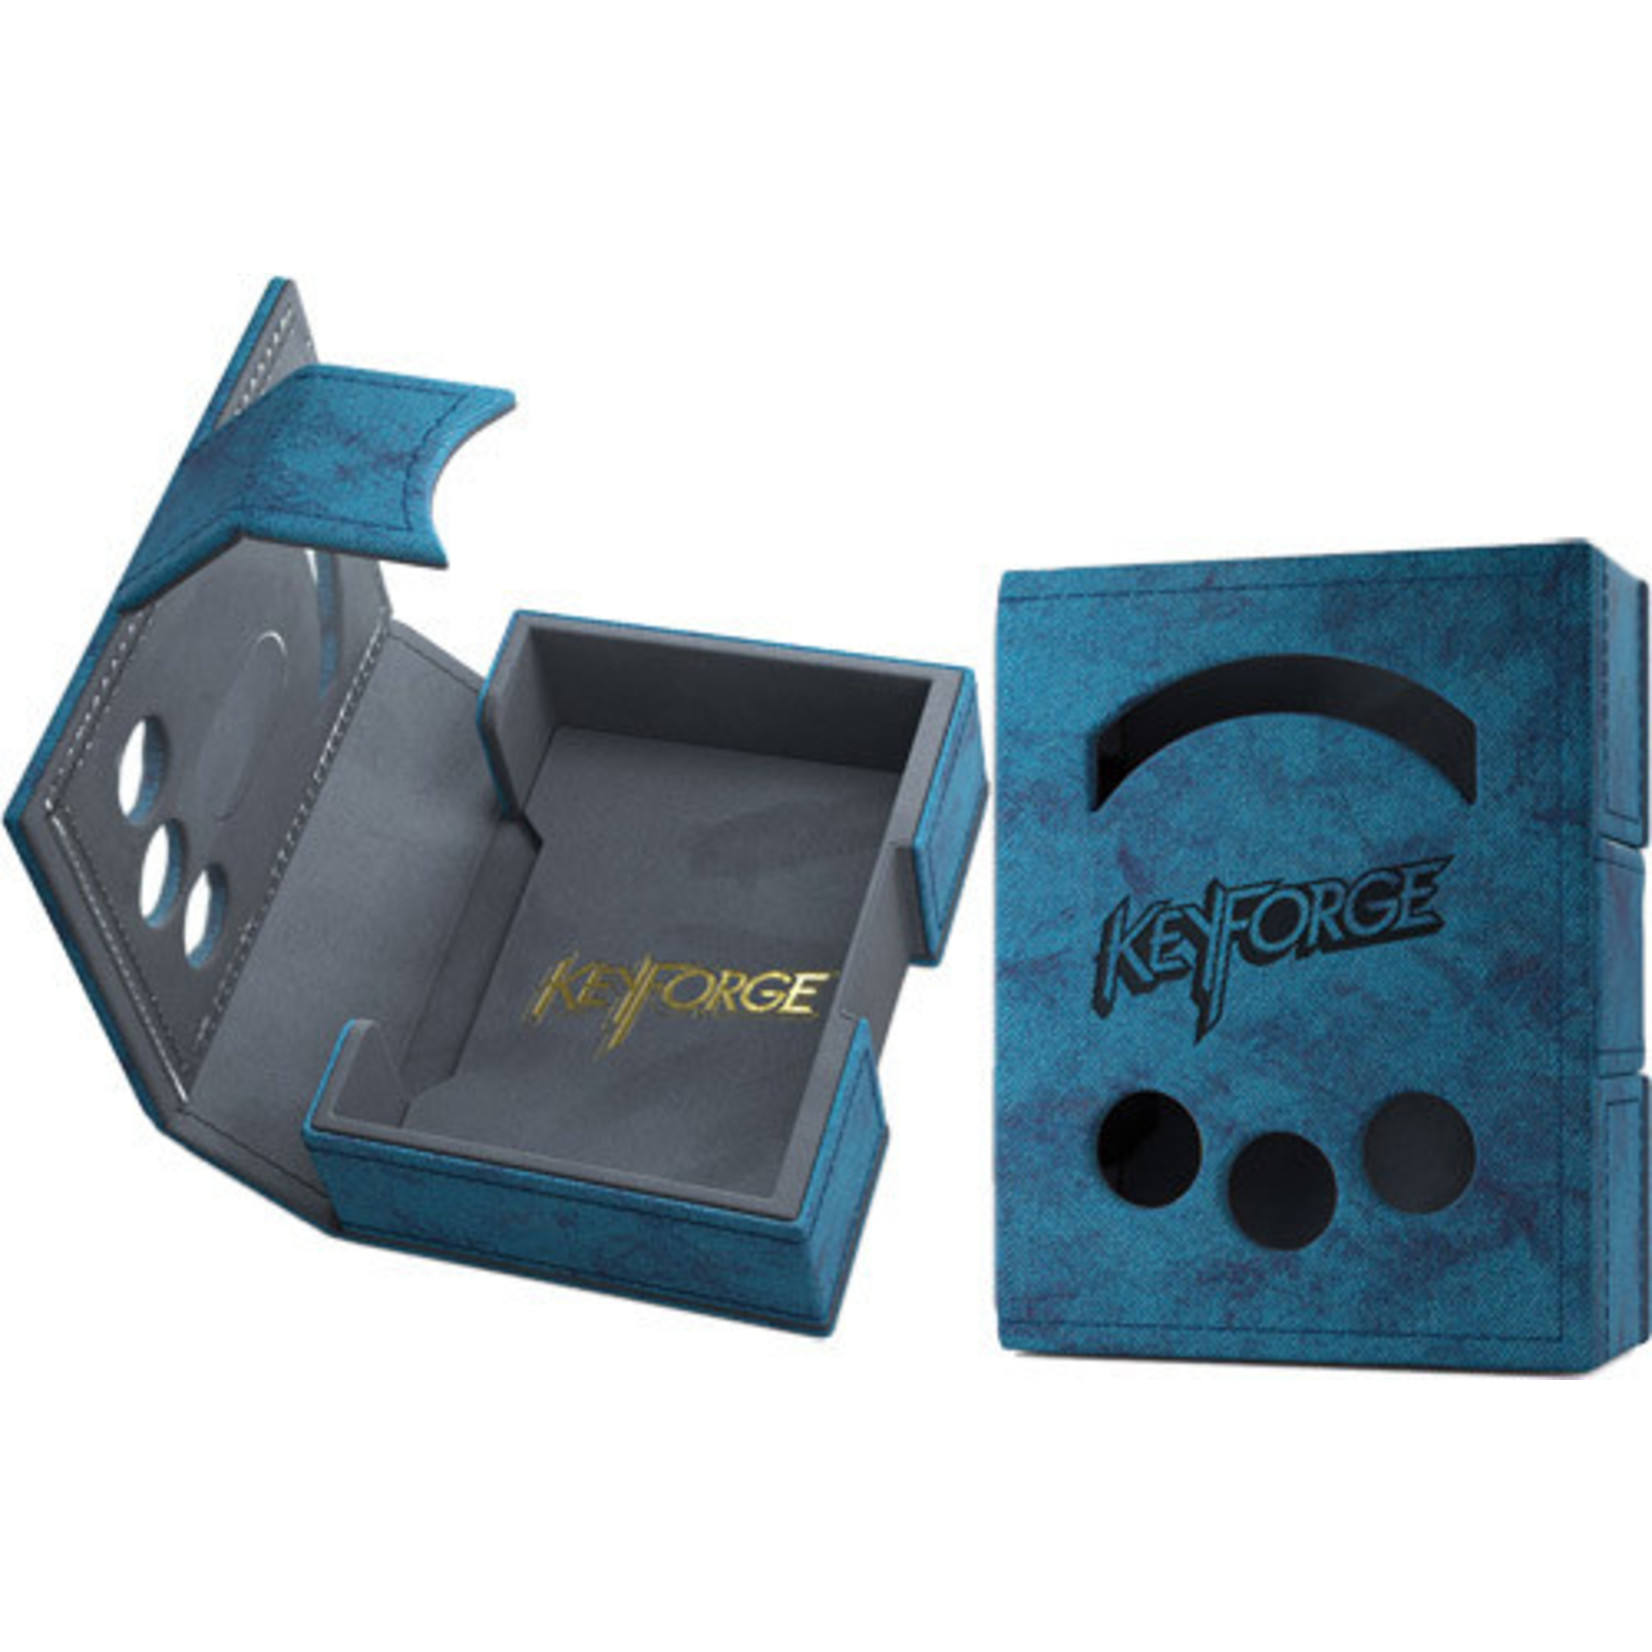 KeyForge: Deck Book - Blue